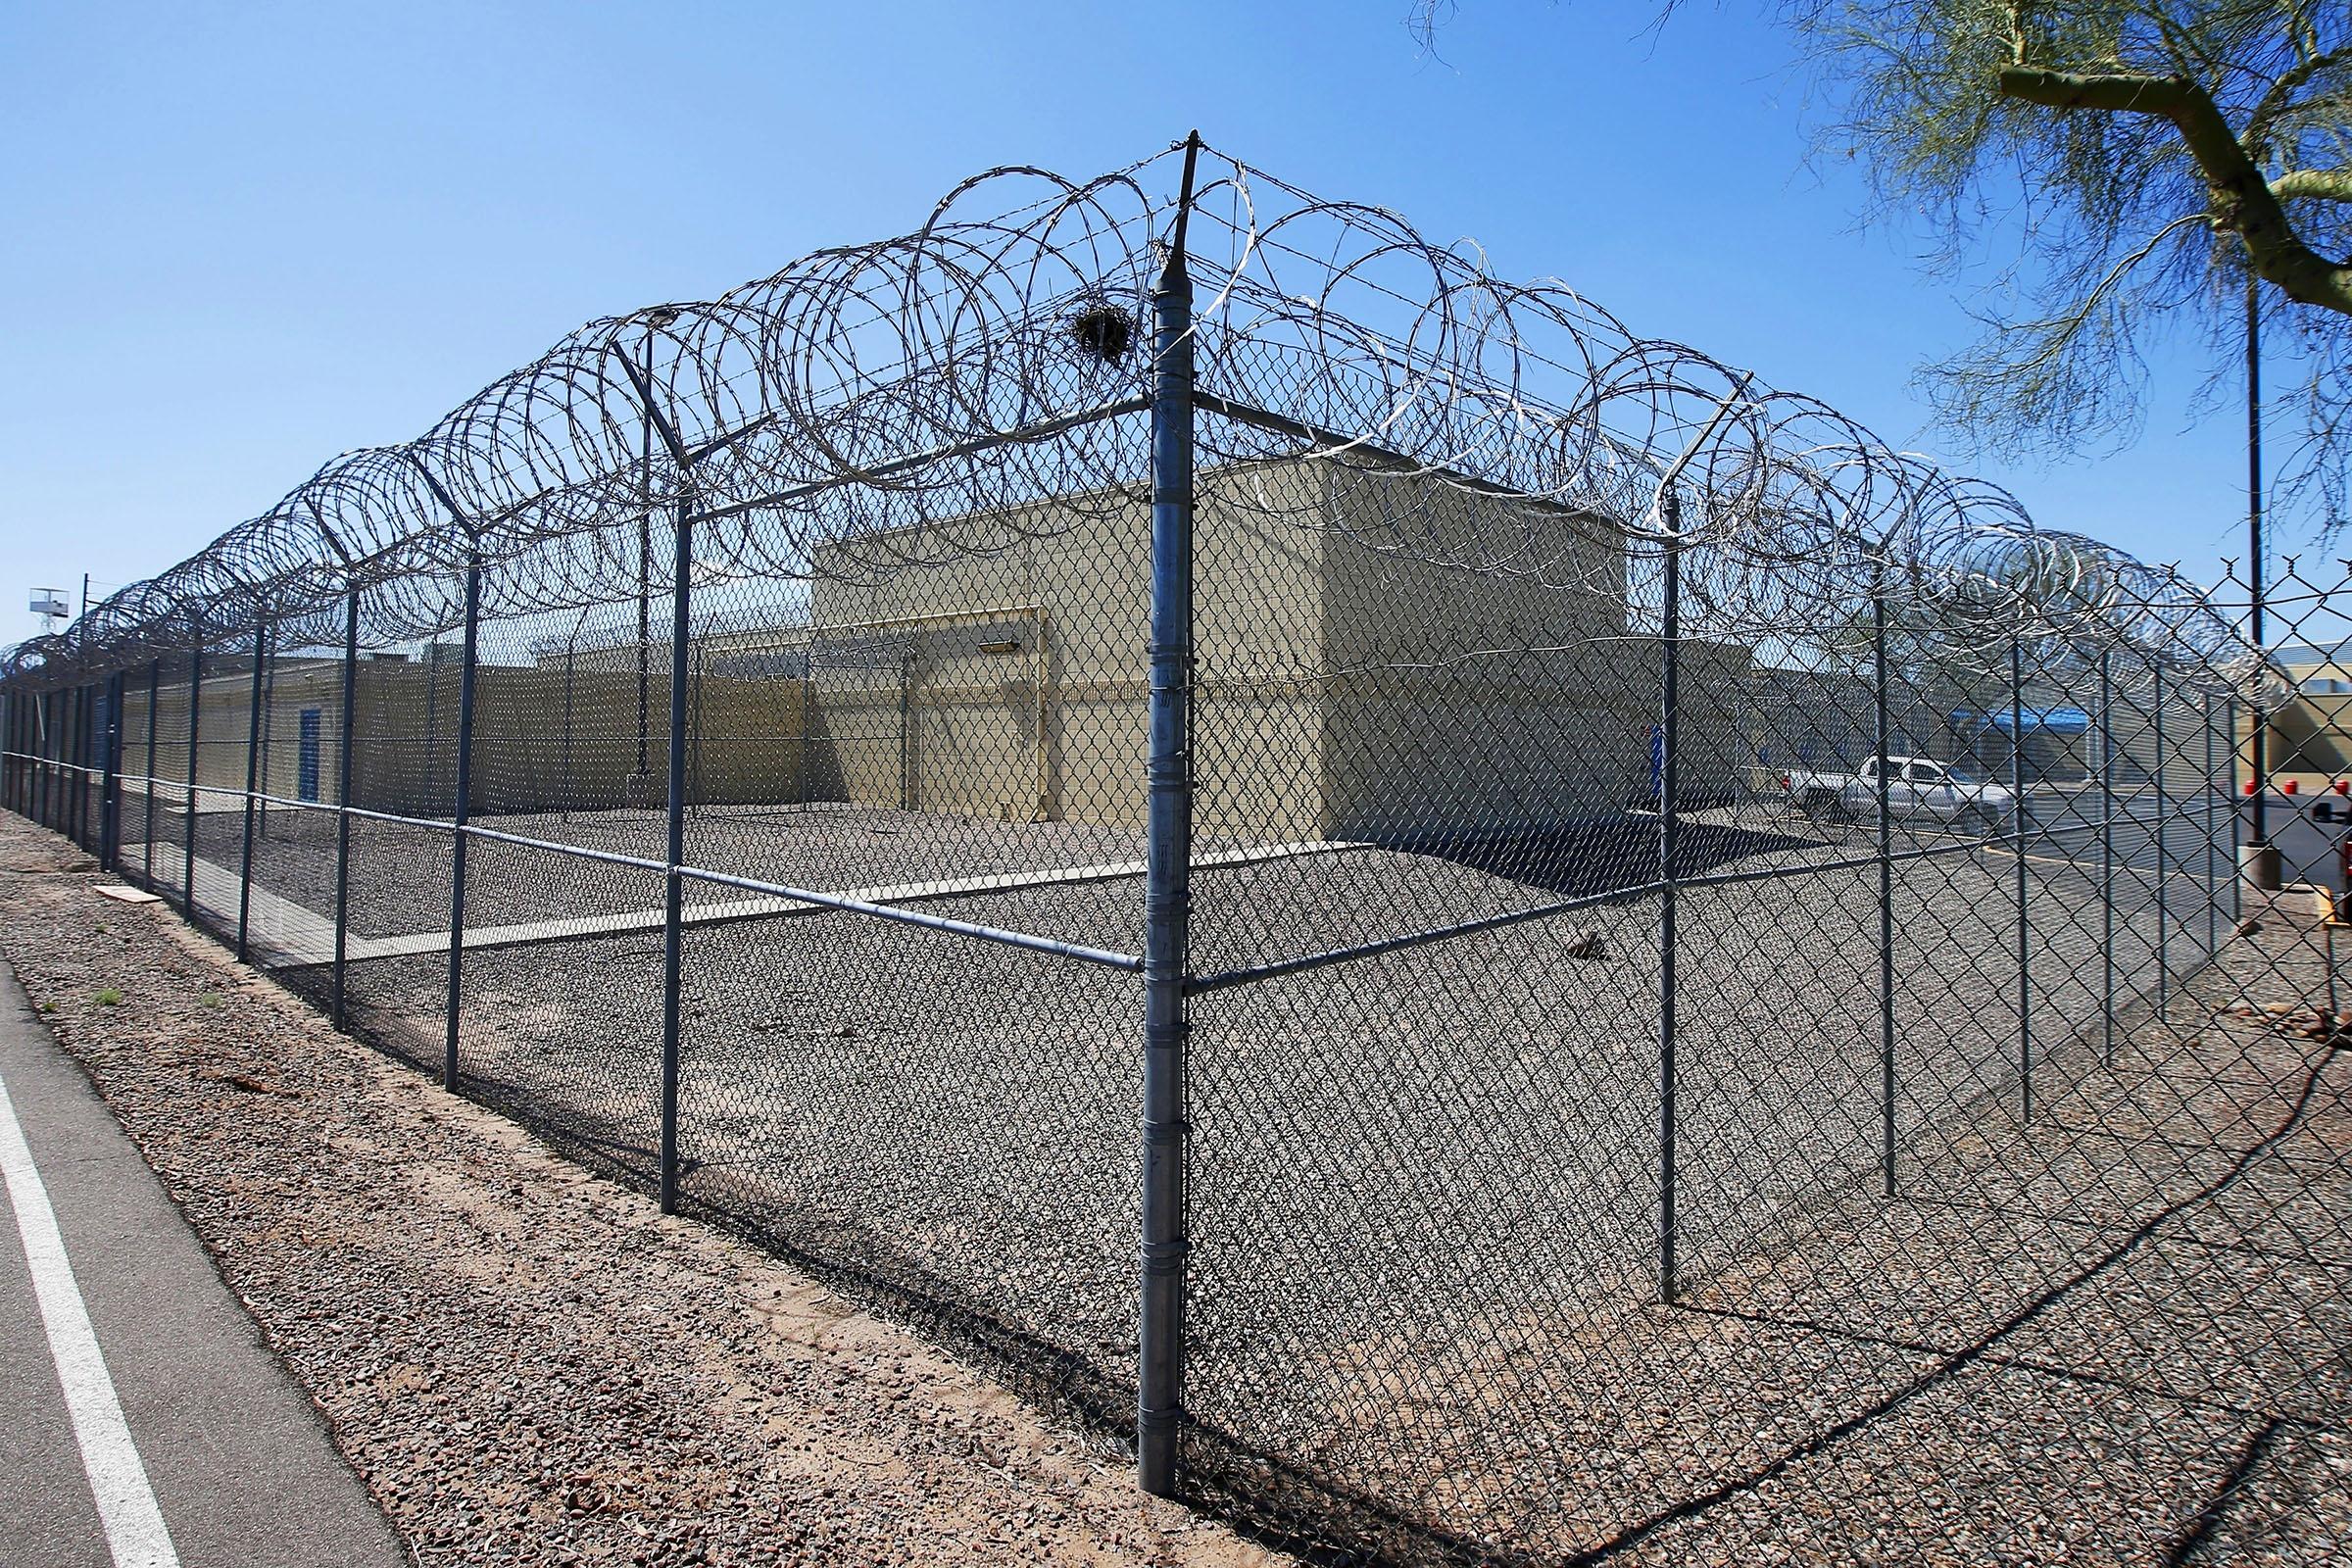 The Maricopa County Estrella Jail in Phoenix, AZ on March 21, 2020.